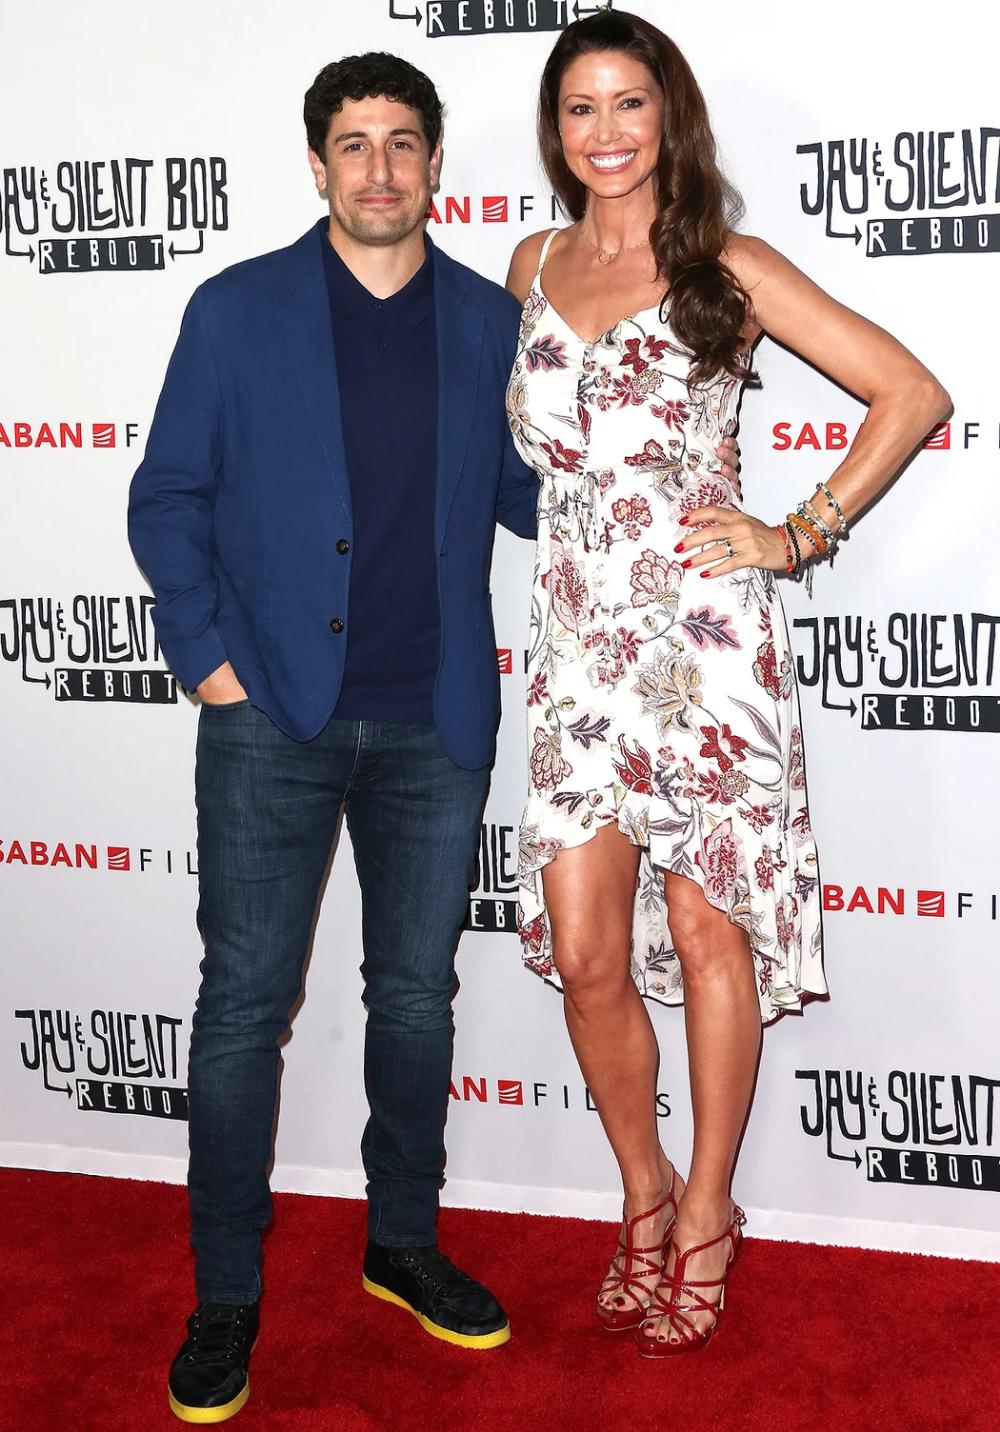 Jason Biggs Reunites with American Pie Costar Shannon